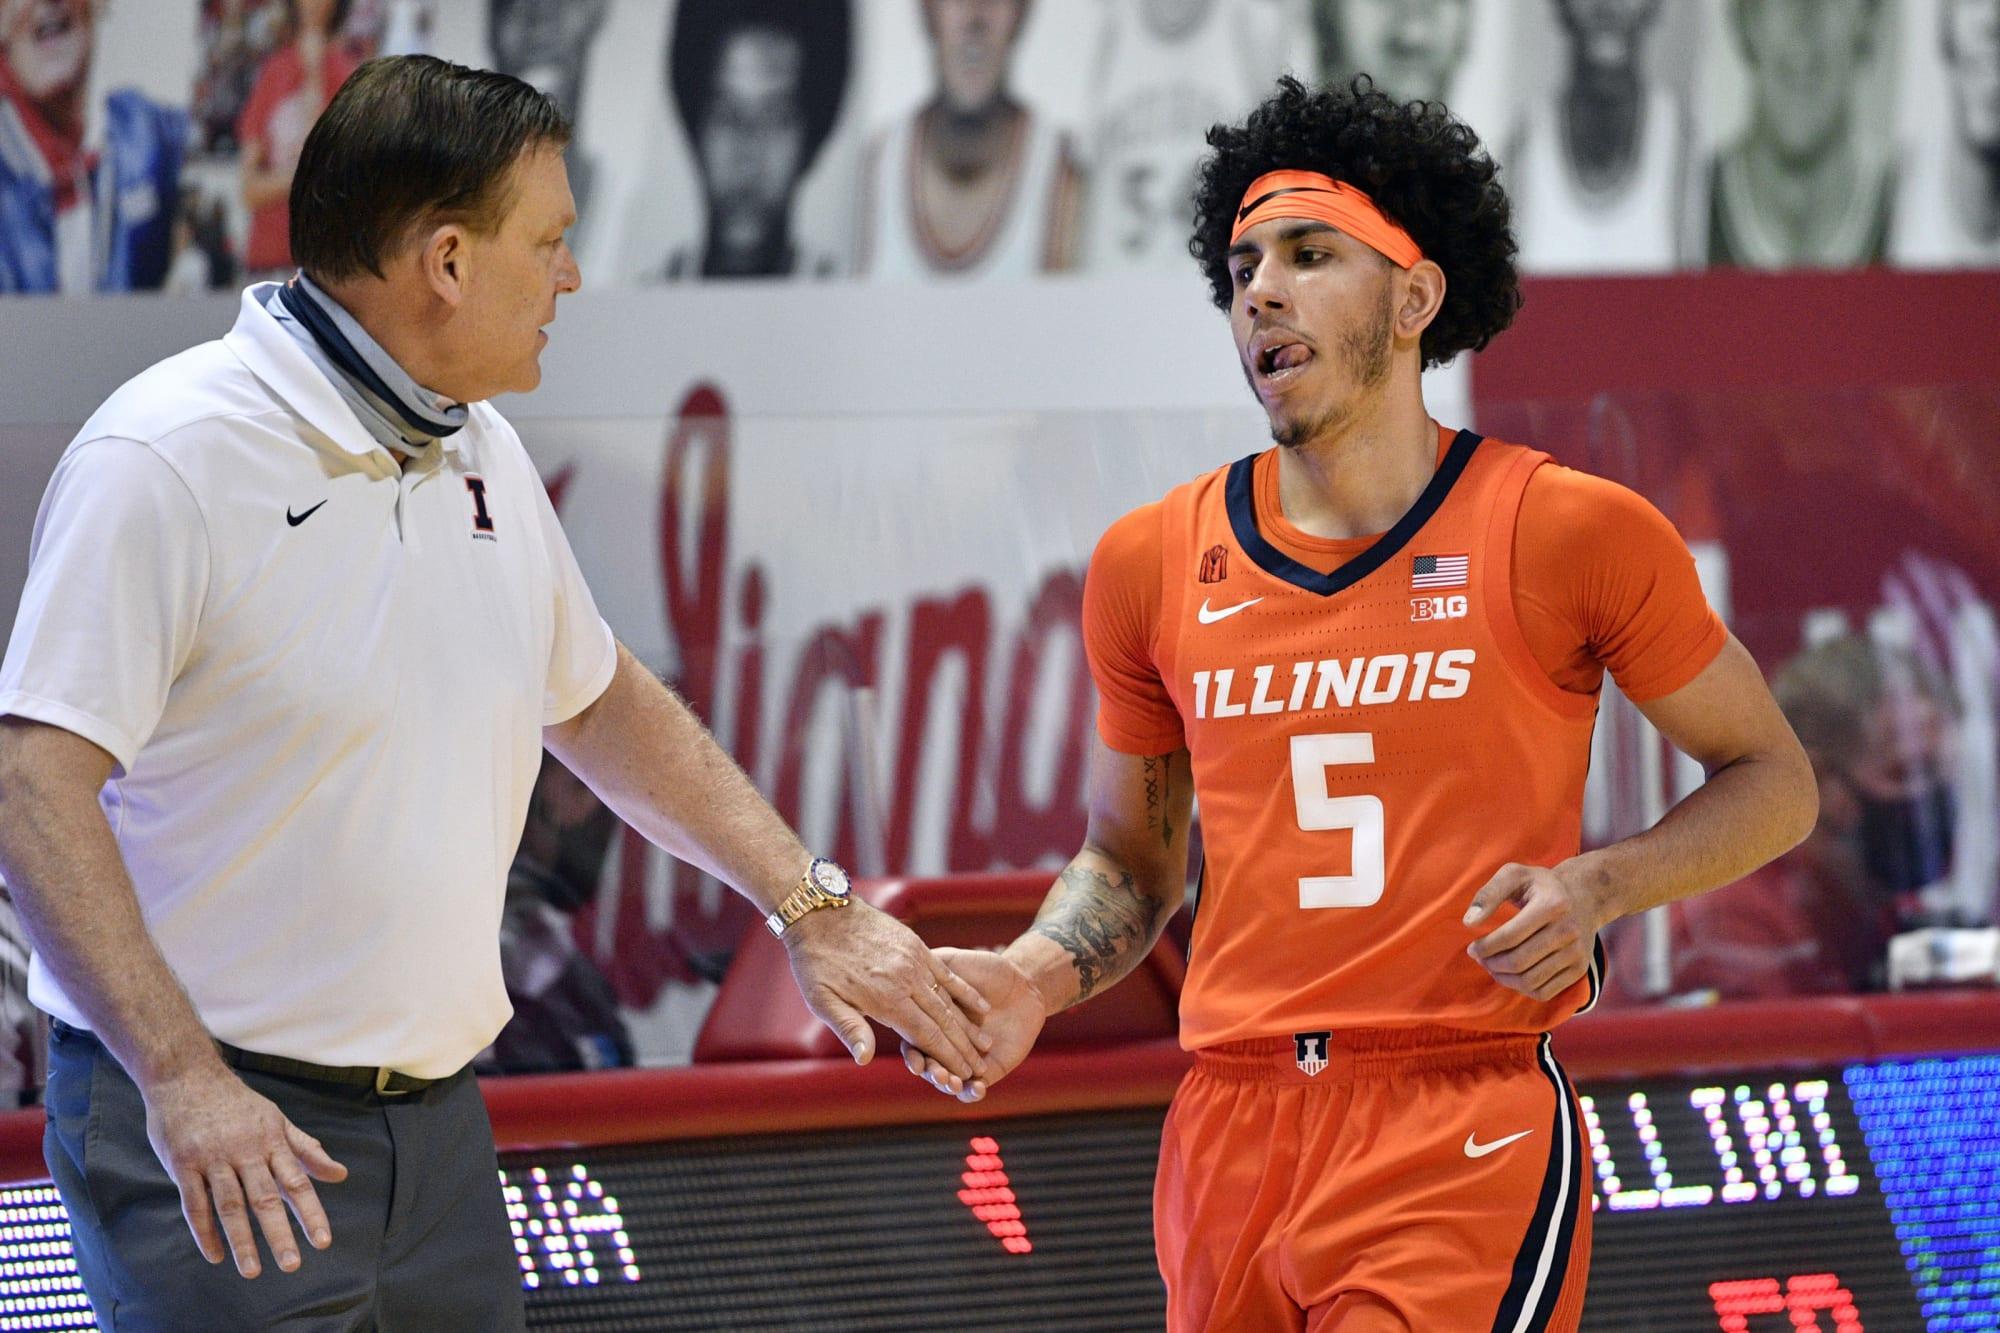 Illinois Basketball: Illini ready for another run to the NCAA tournament